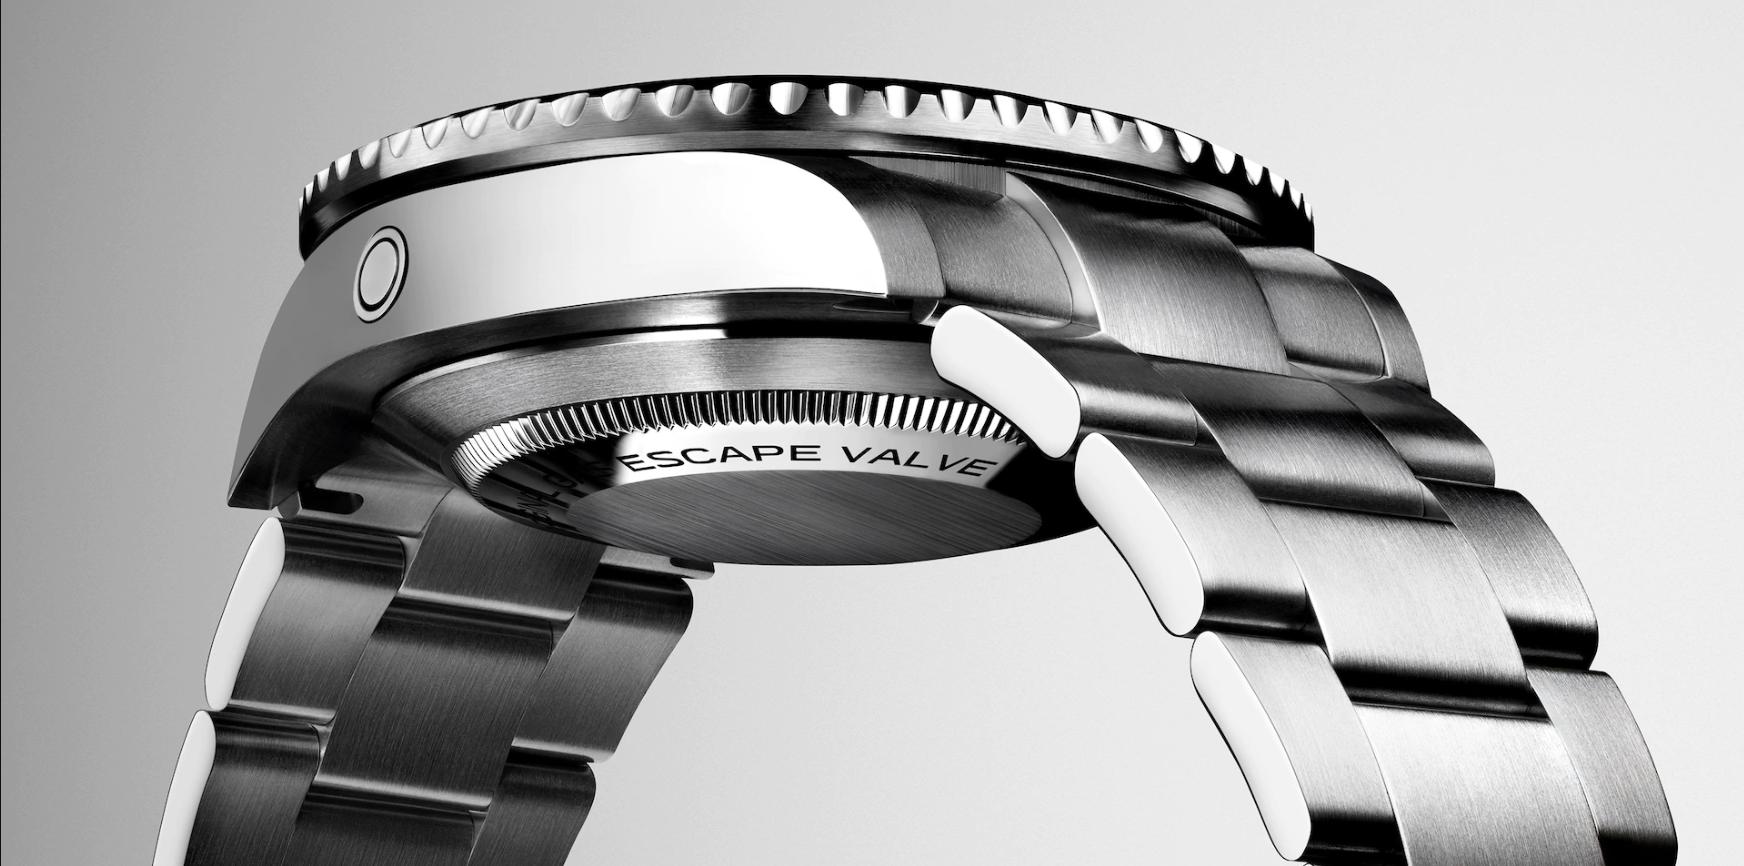 Rolex Deepsea Escape Valve, Rolex Deepsea Watches